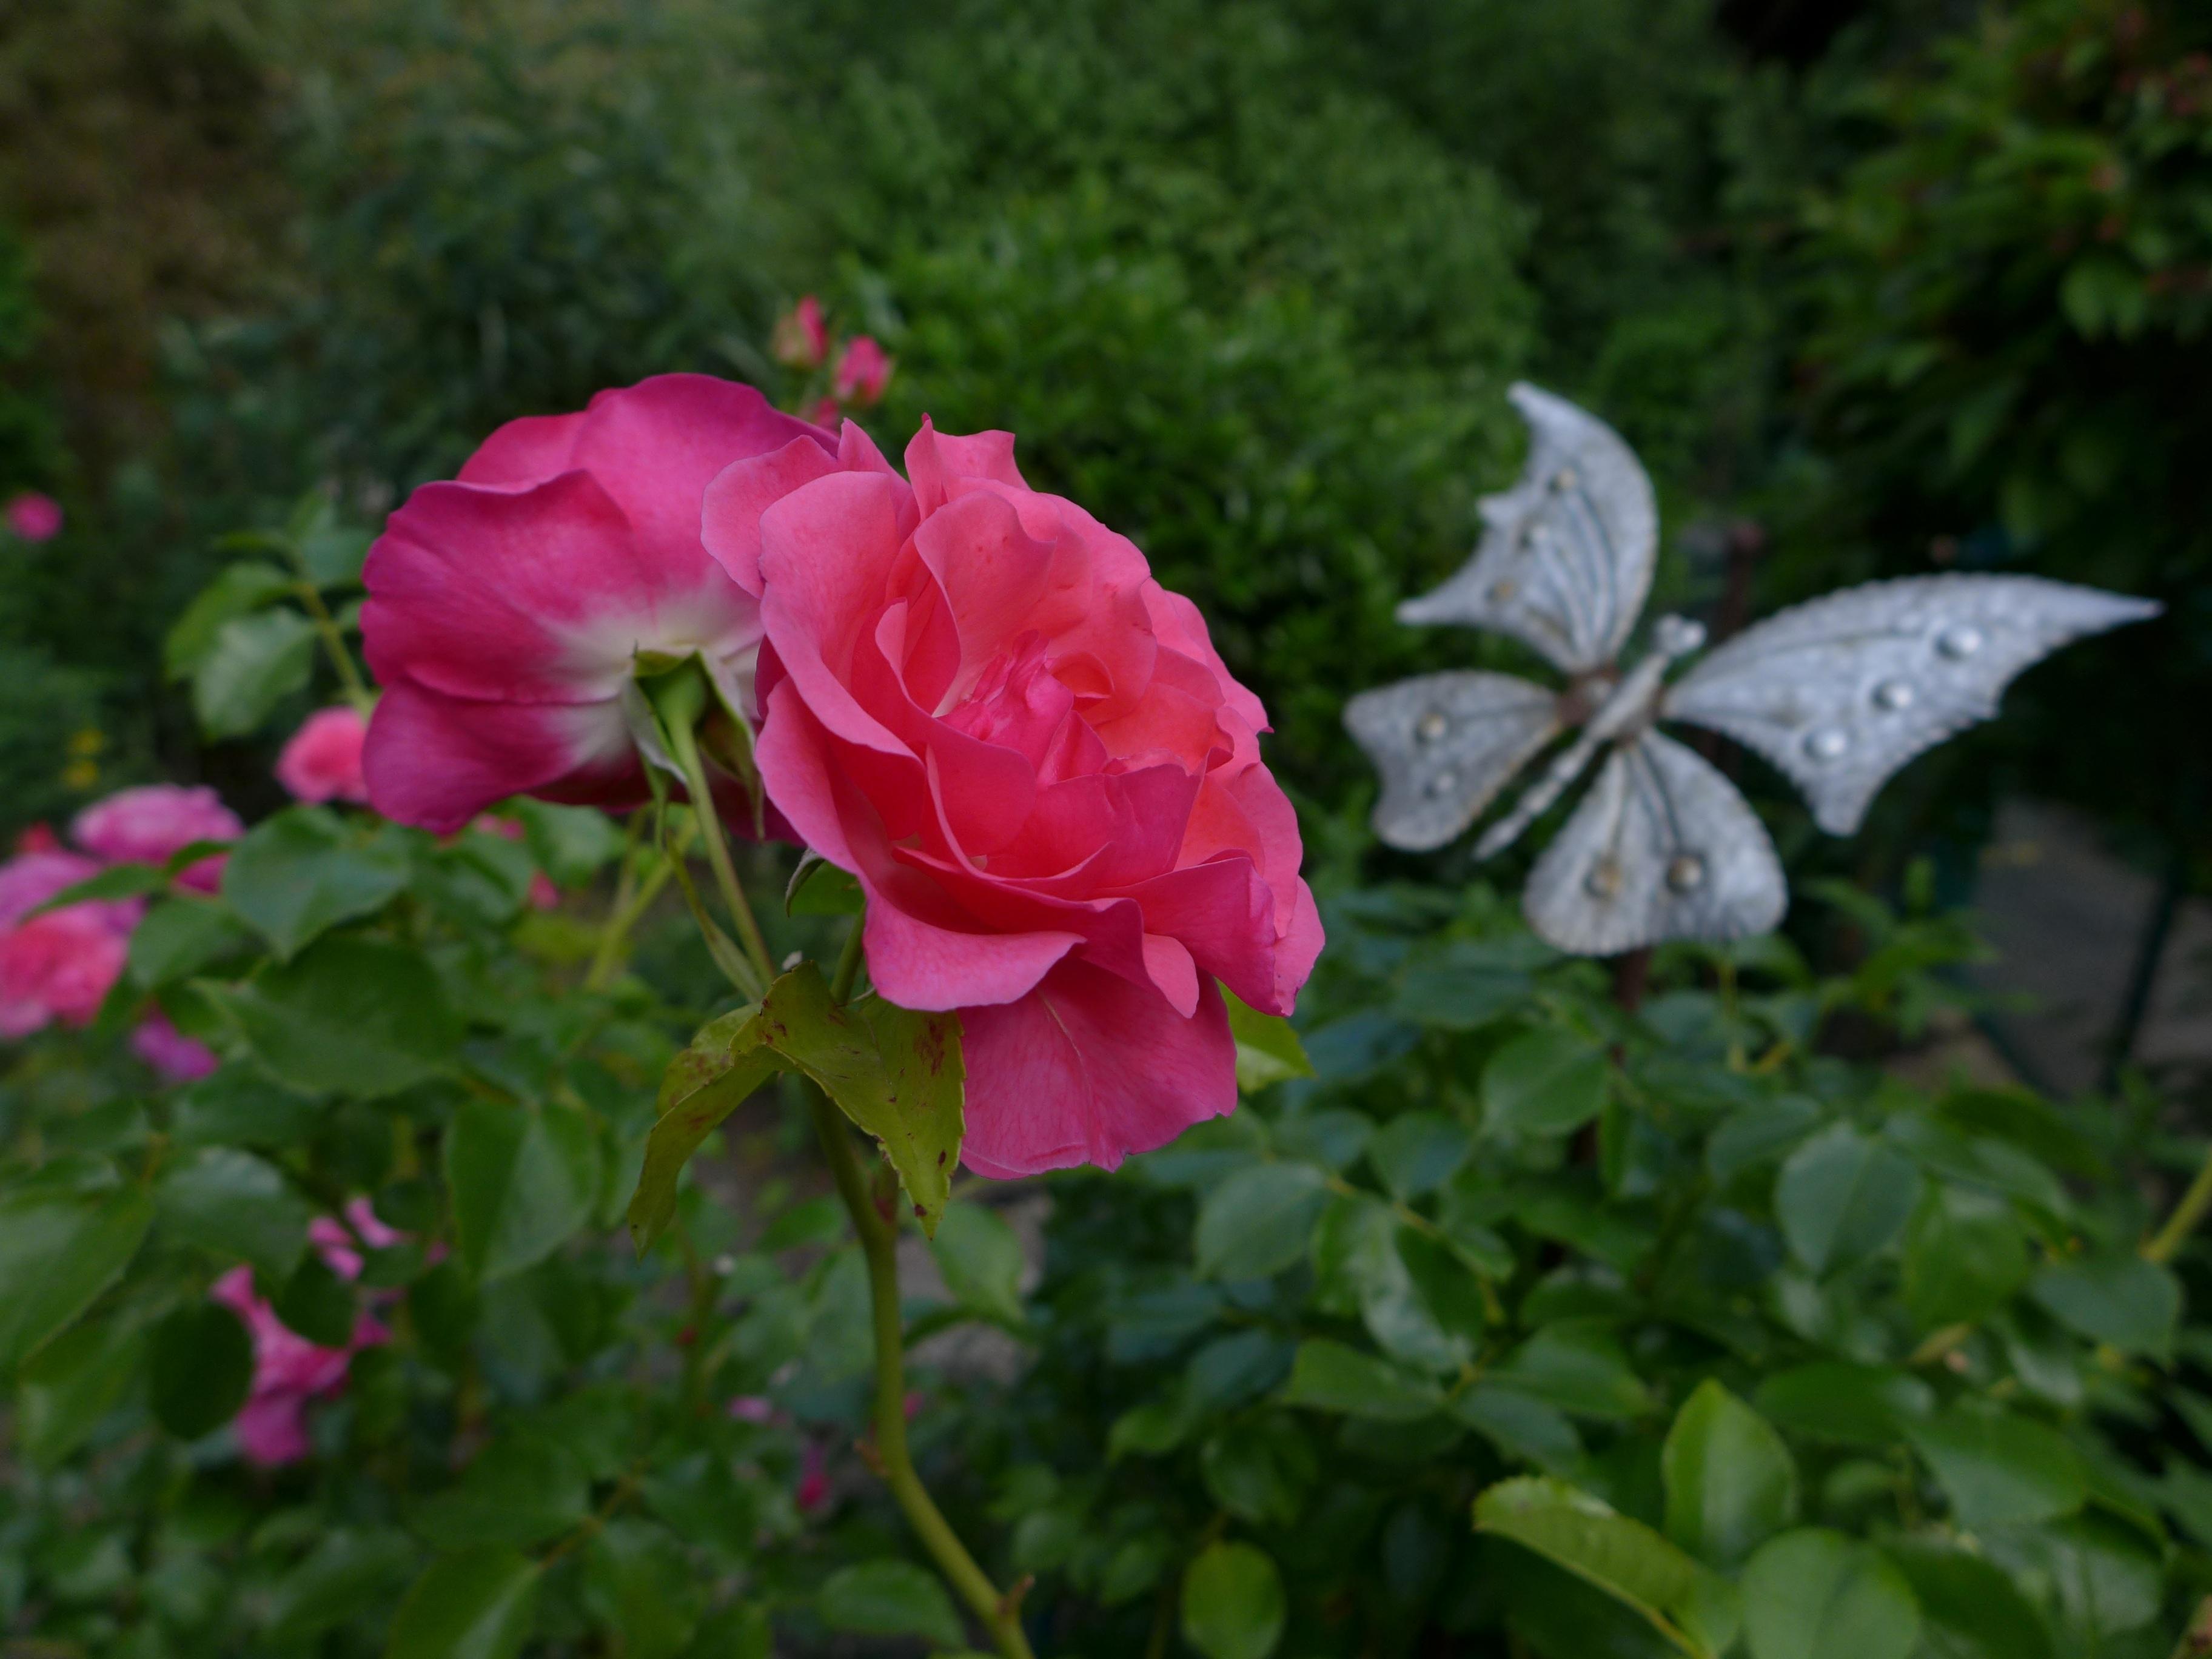 Immagini belle : natura petalo verde botanica farfalla flora